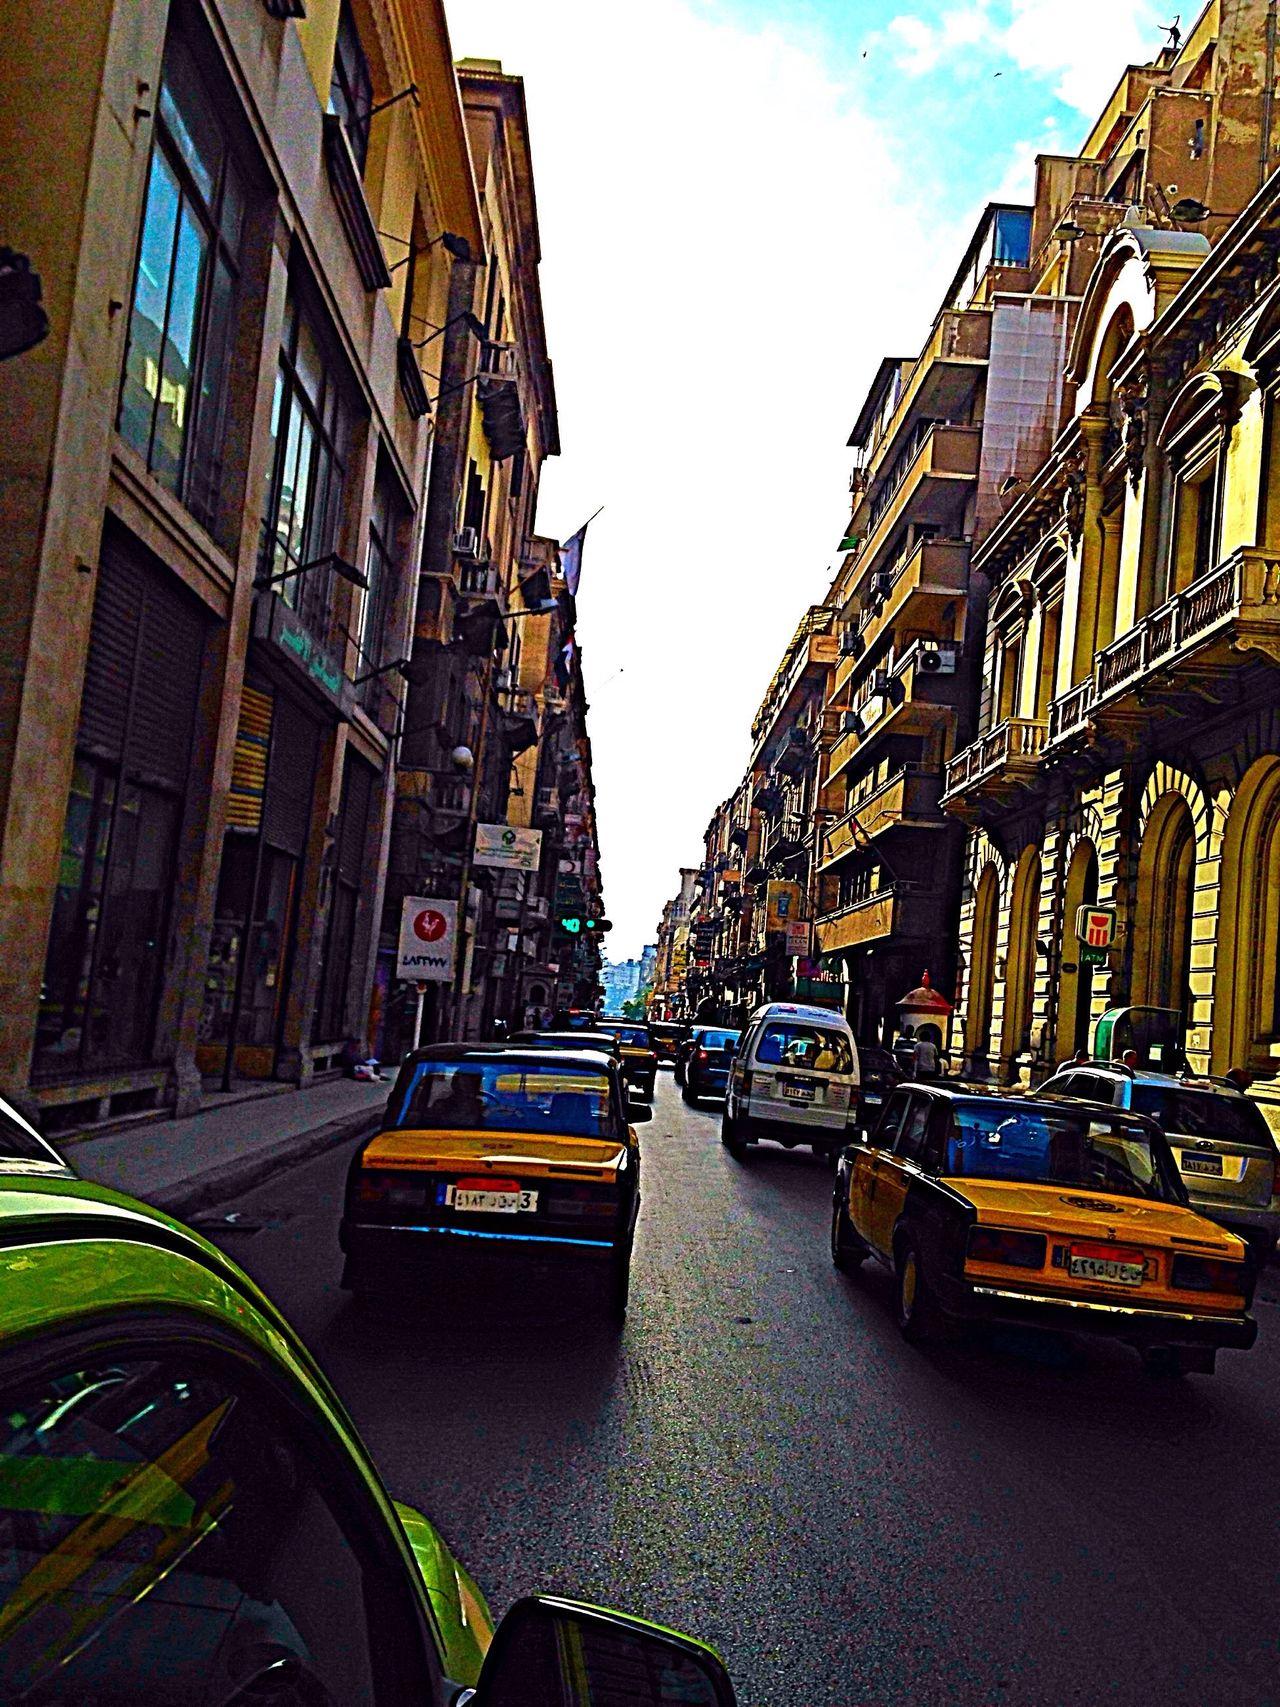 Alexandria Egypt First Eyeem Photo City Alexandria Egypt Car Blue Sky Street No People The Street Photographer - 2017 EyeEm Awards